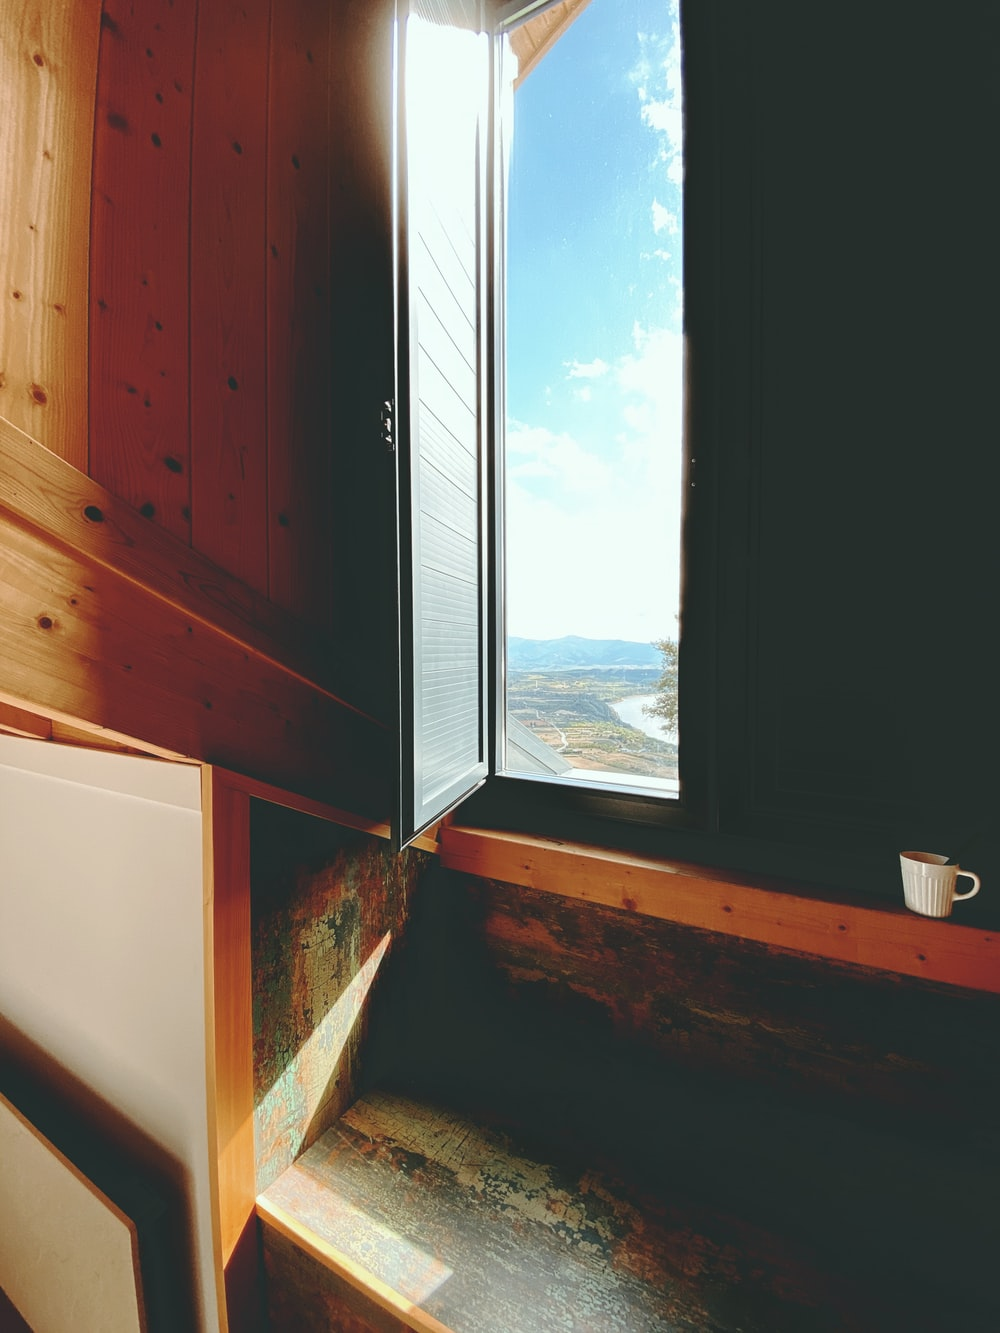 brown wooden cabinet beside window